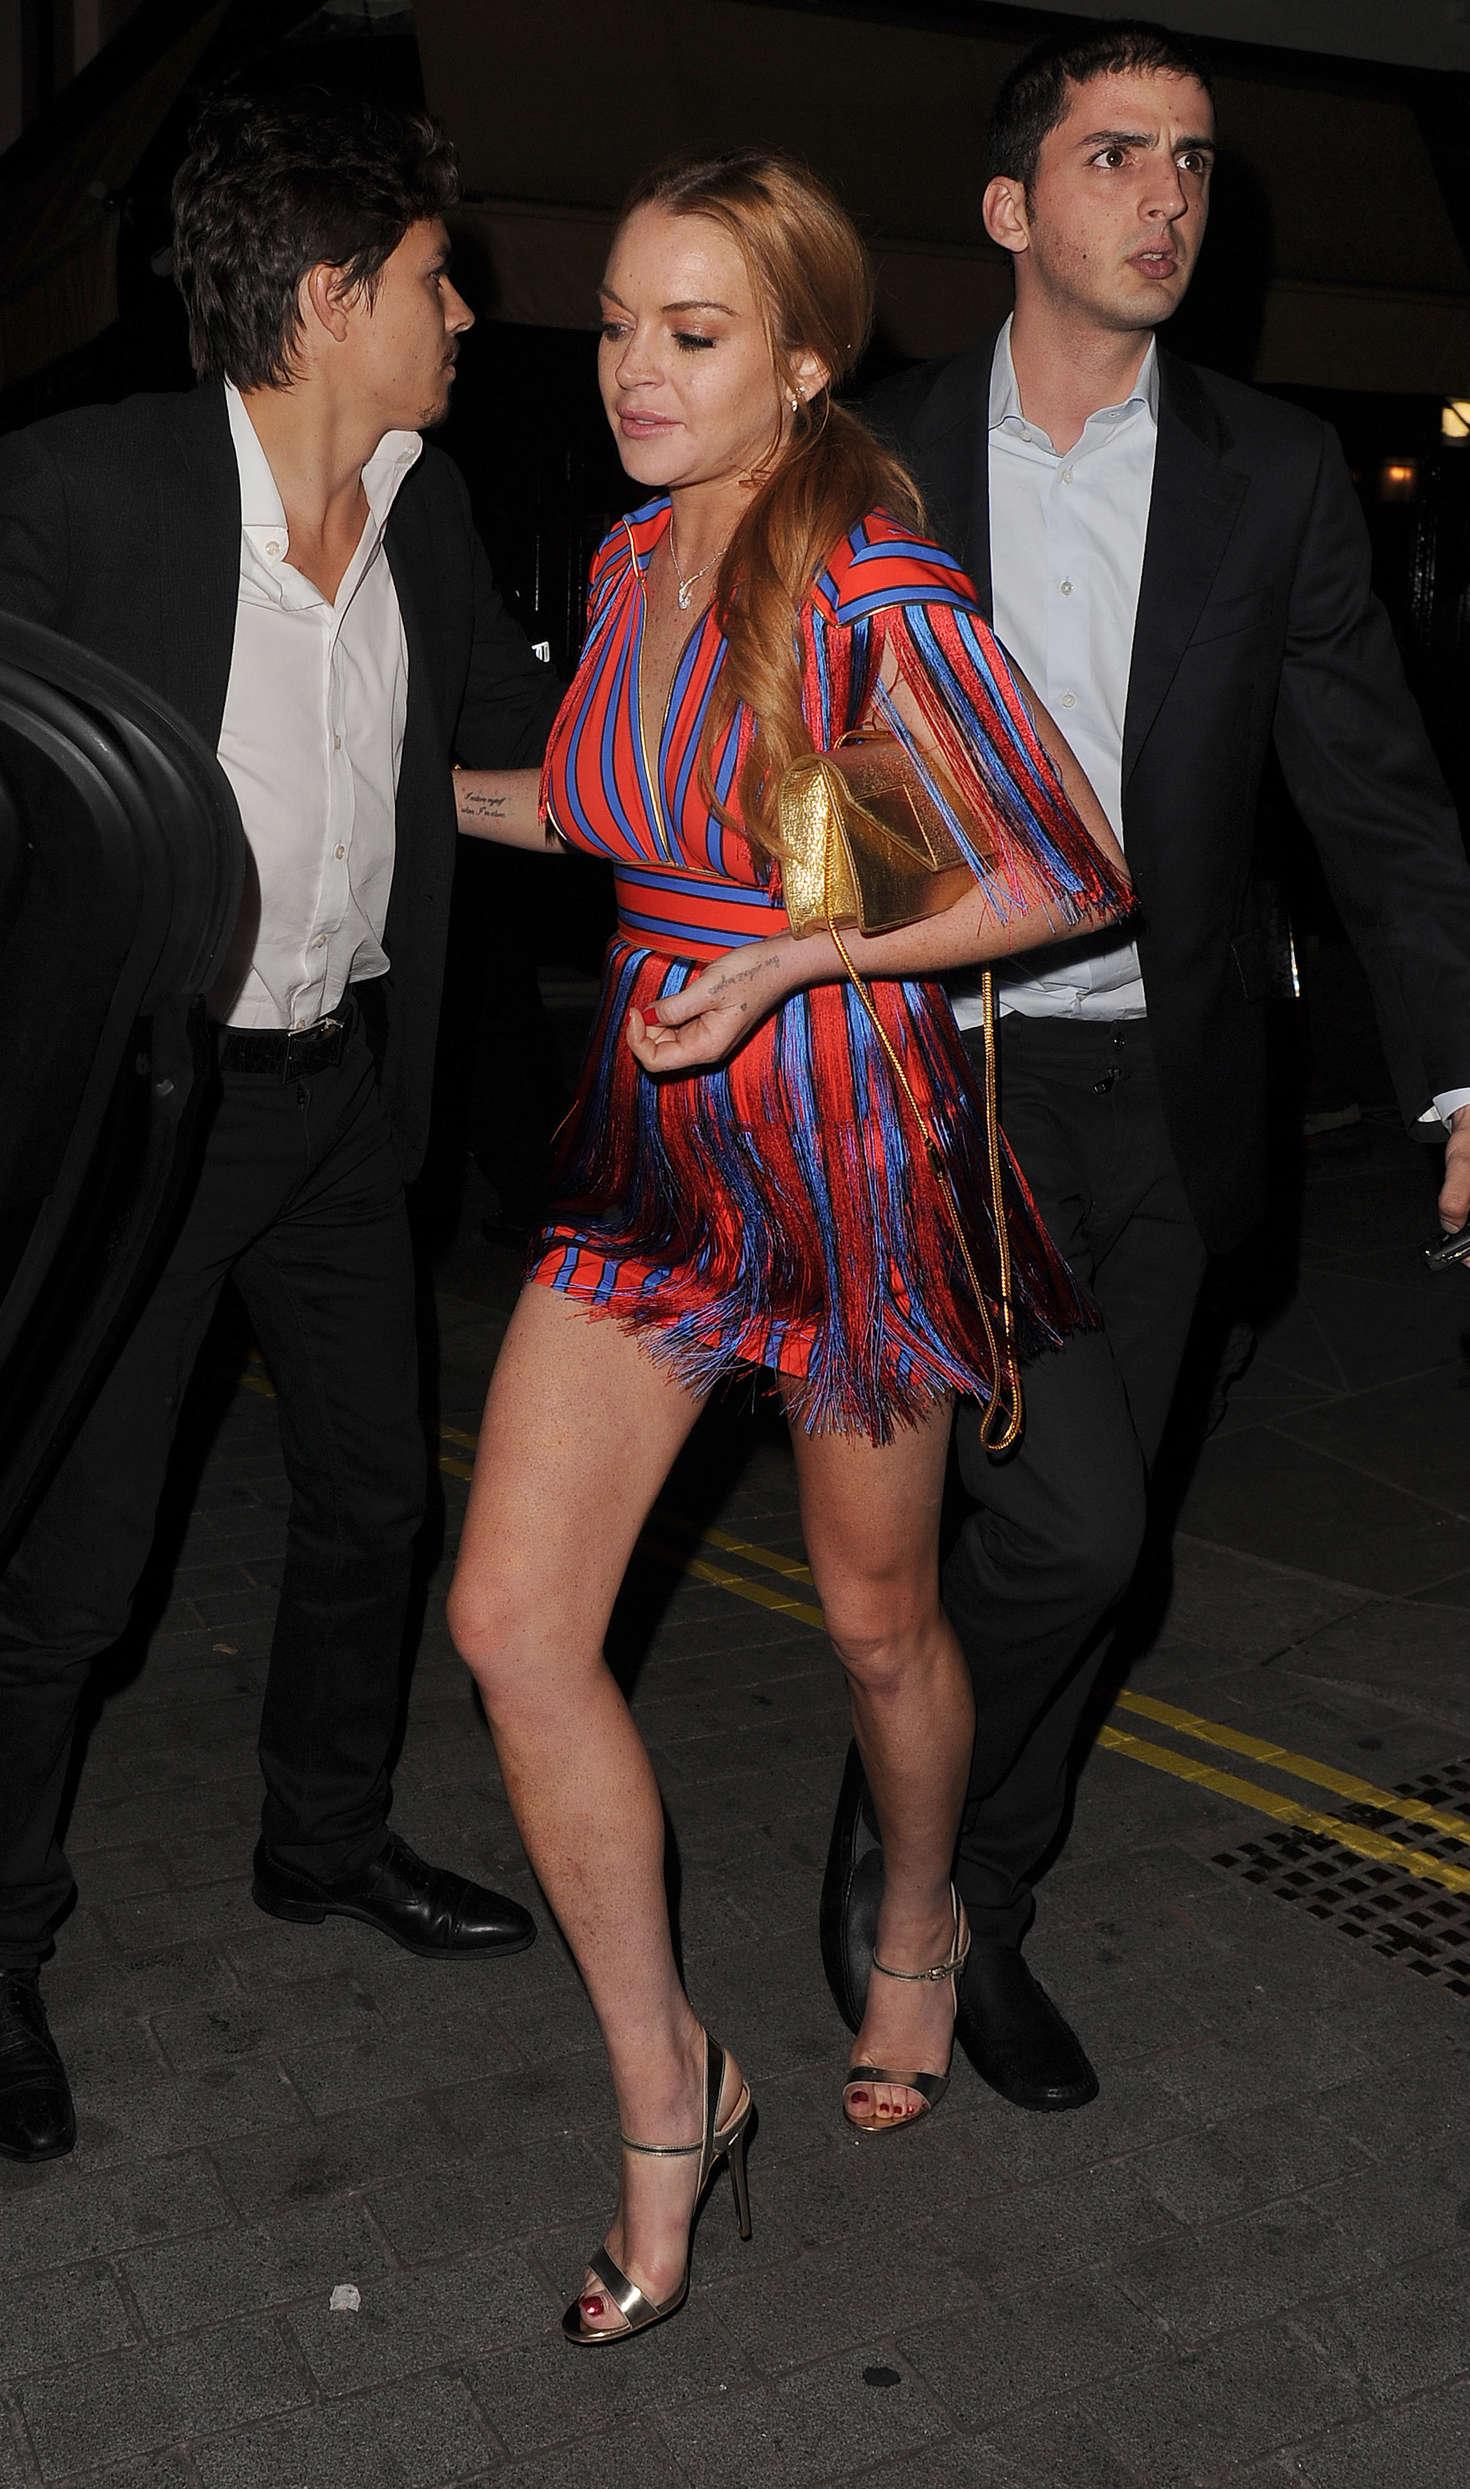 Lindsay Lohan 2016 : Lindsay Lohan and Kourtney Kardashian: Leaving Ours Restaurant -04